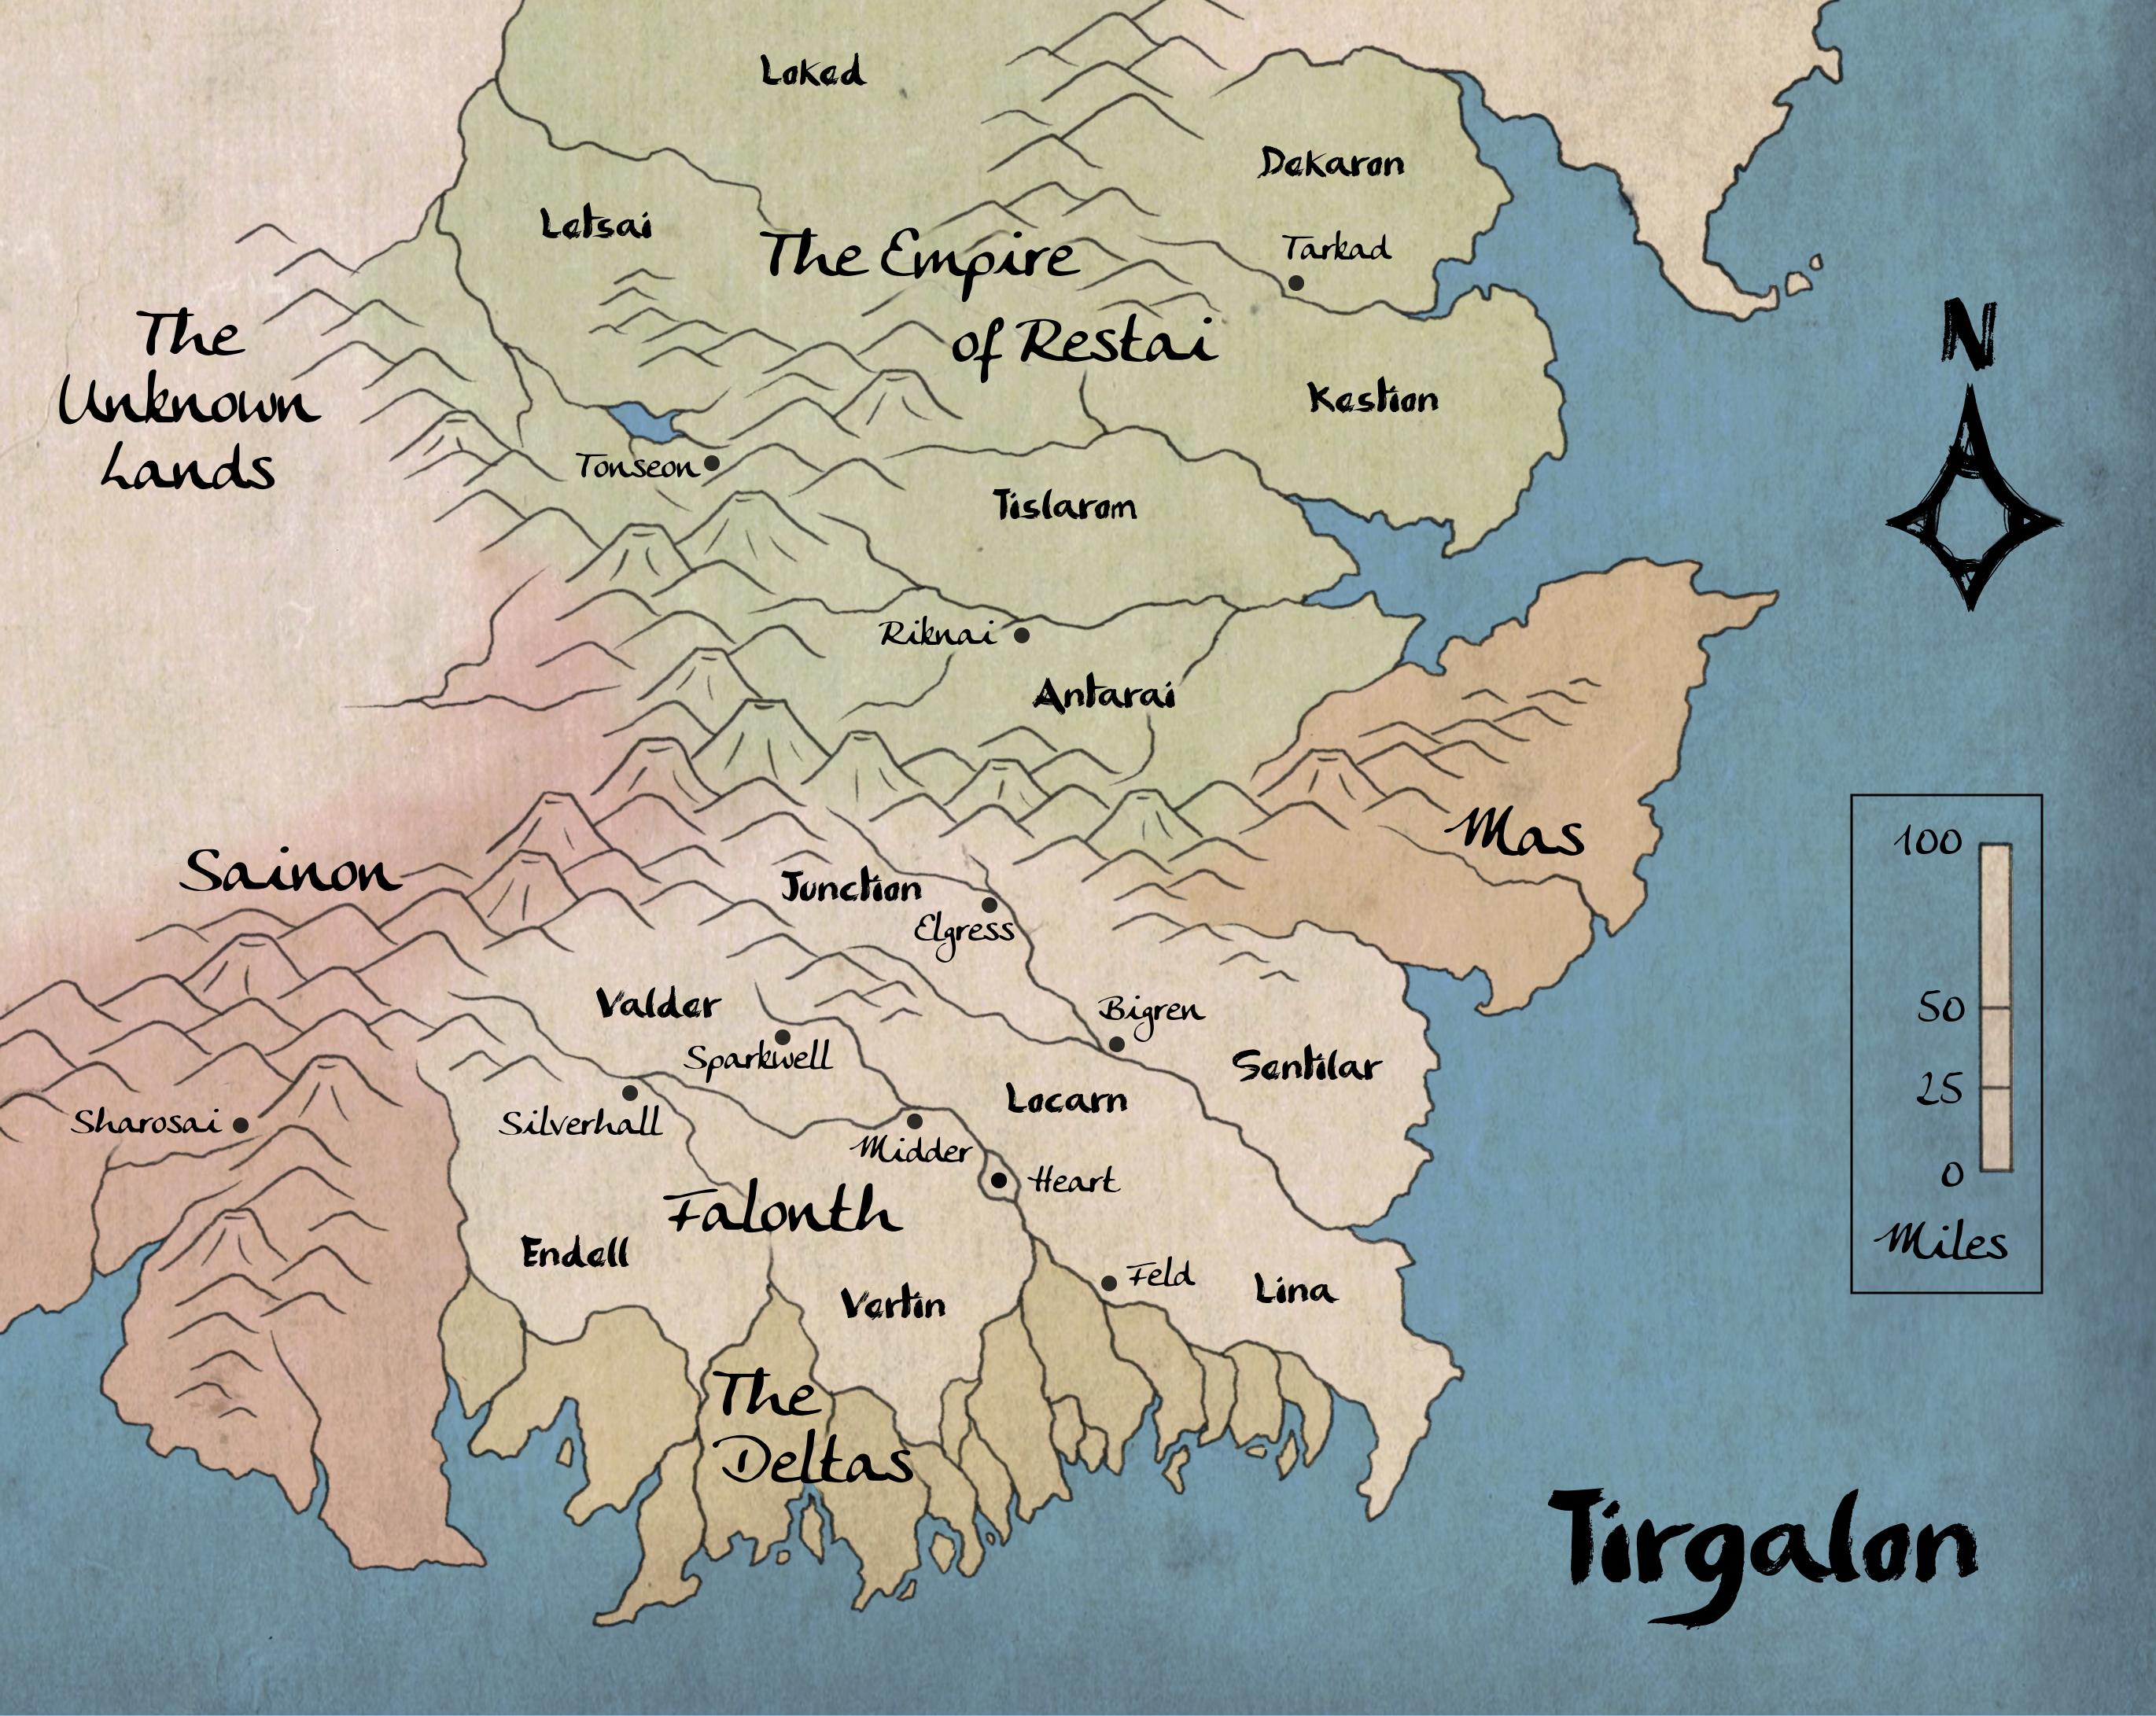 Tirgalon Map